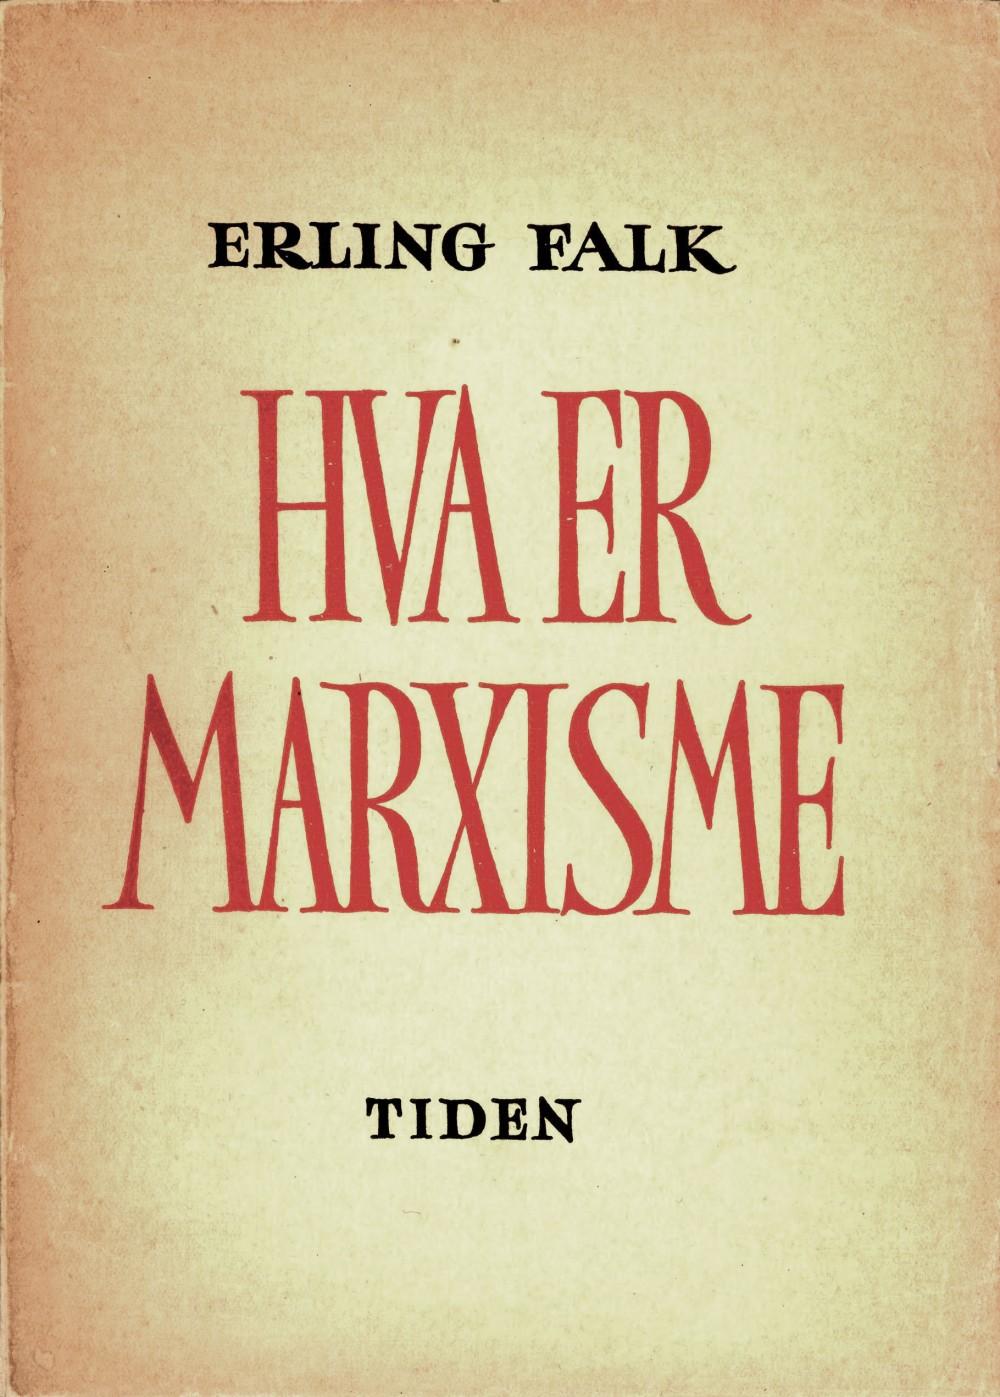 Erling Falk: Hva er marxisme